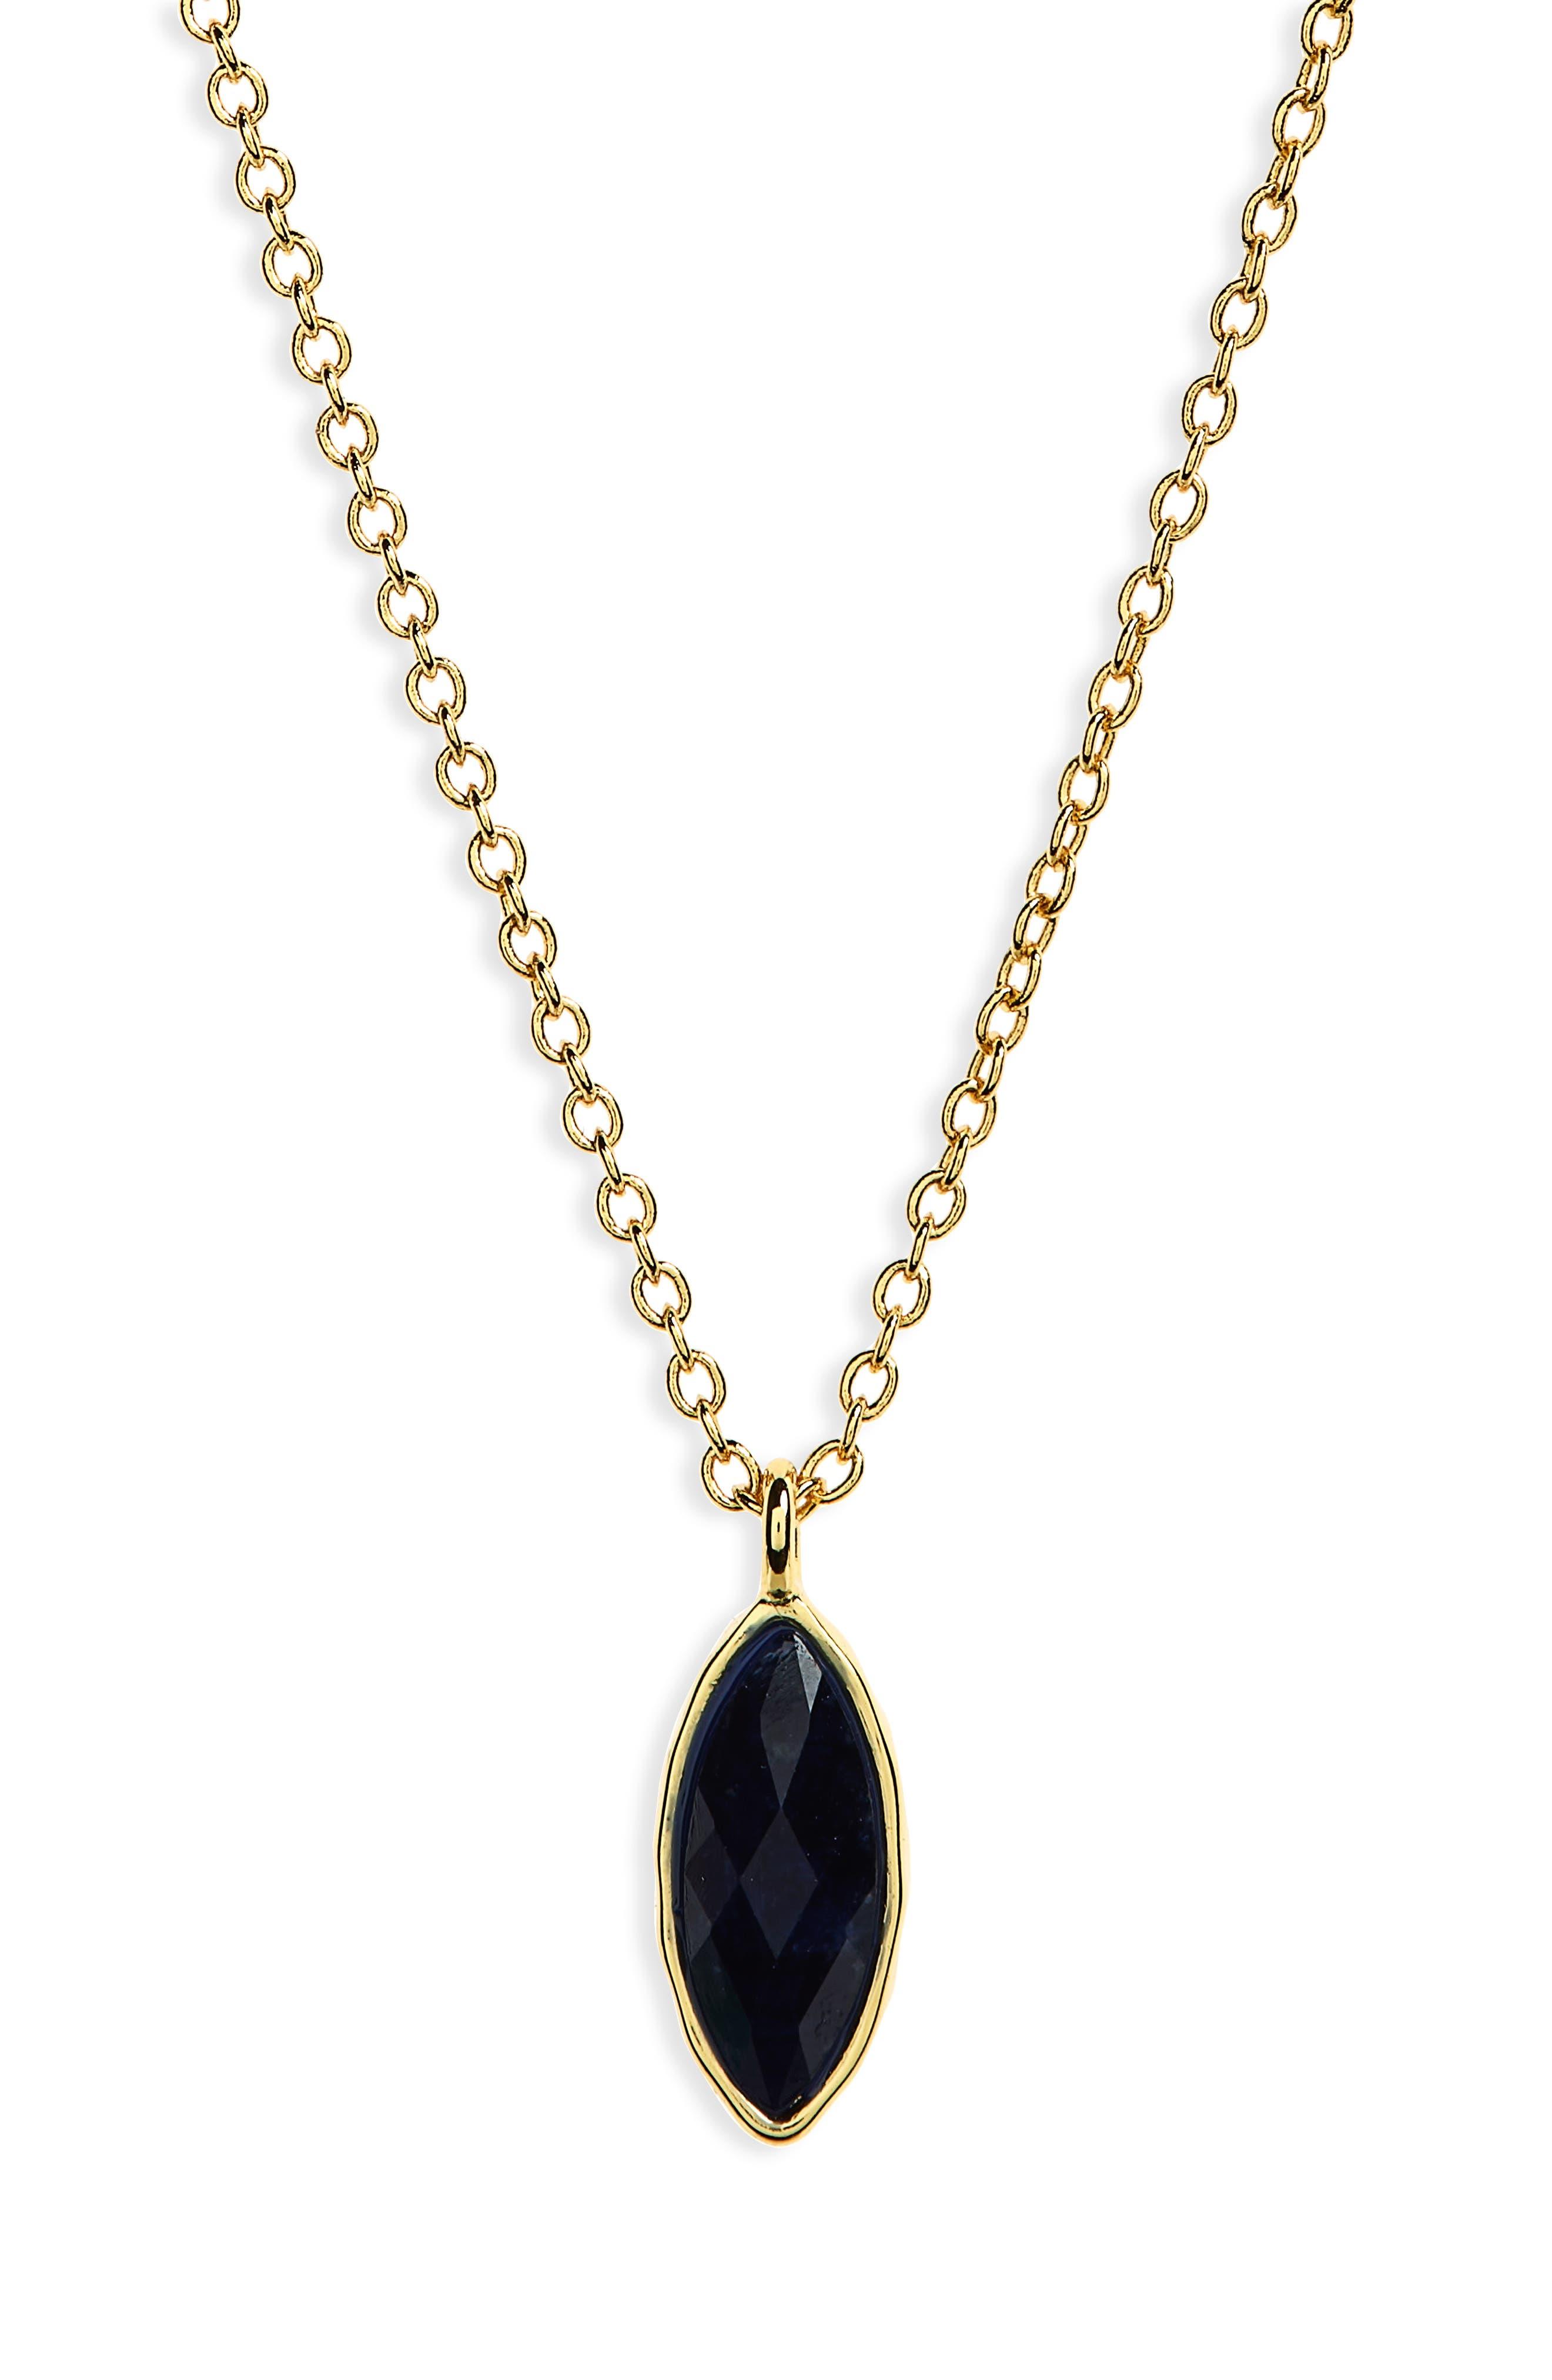 Palisades Adjustable Charm Necklace,                             Main thumbnail 1, color,                             Sodalite/ Gold